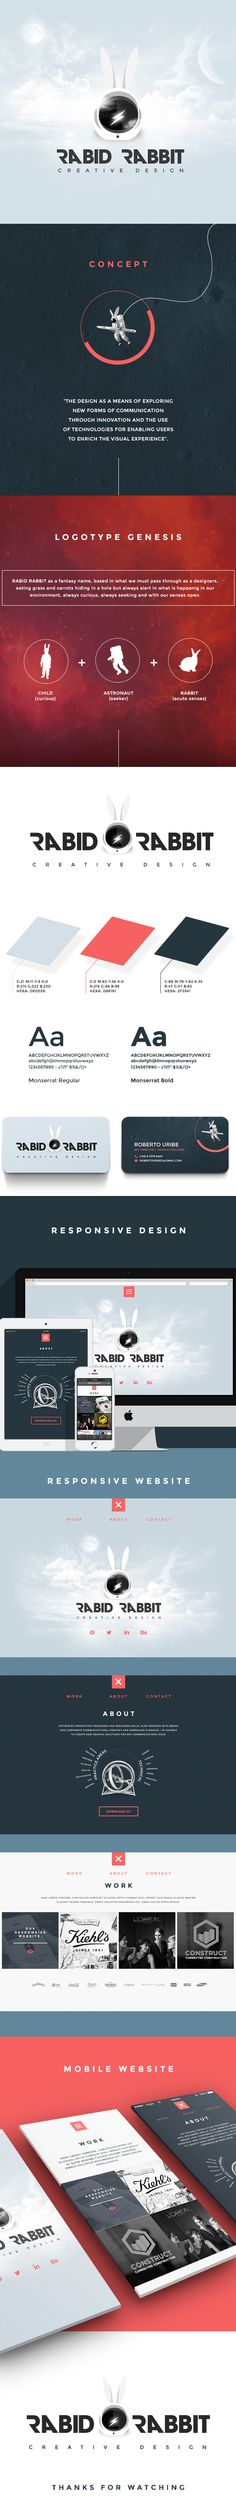 Rabid Rabbit - Brand - Responsive design on Behance